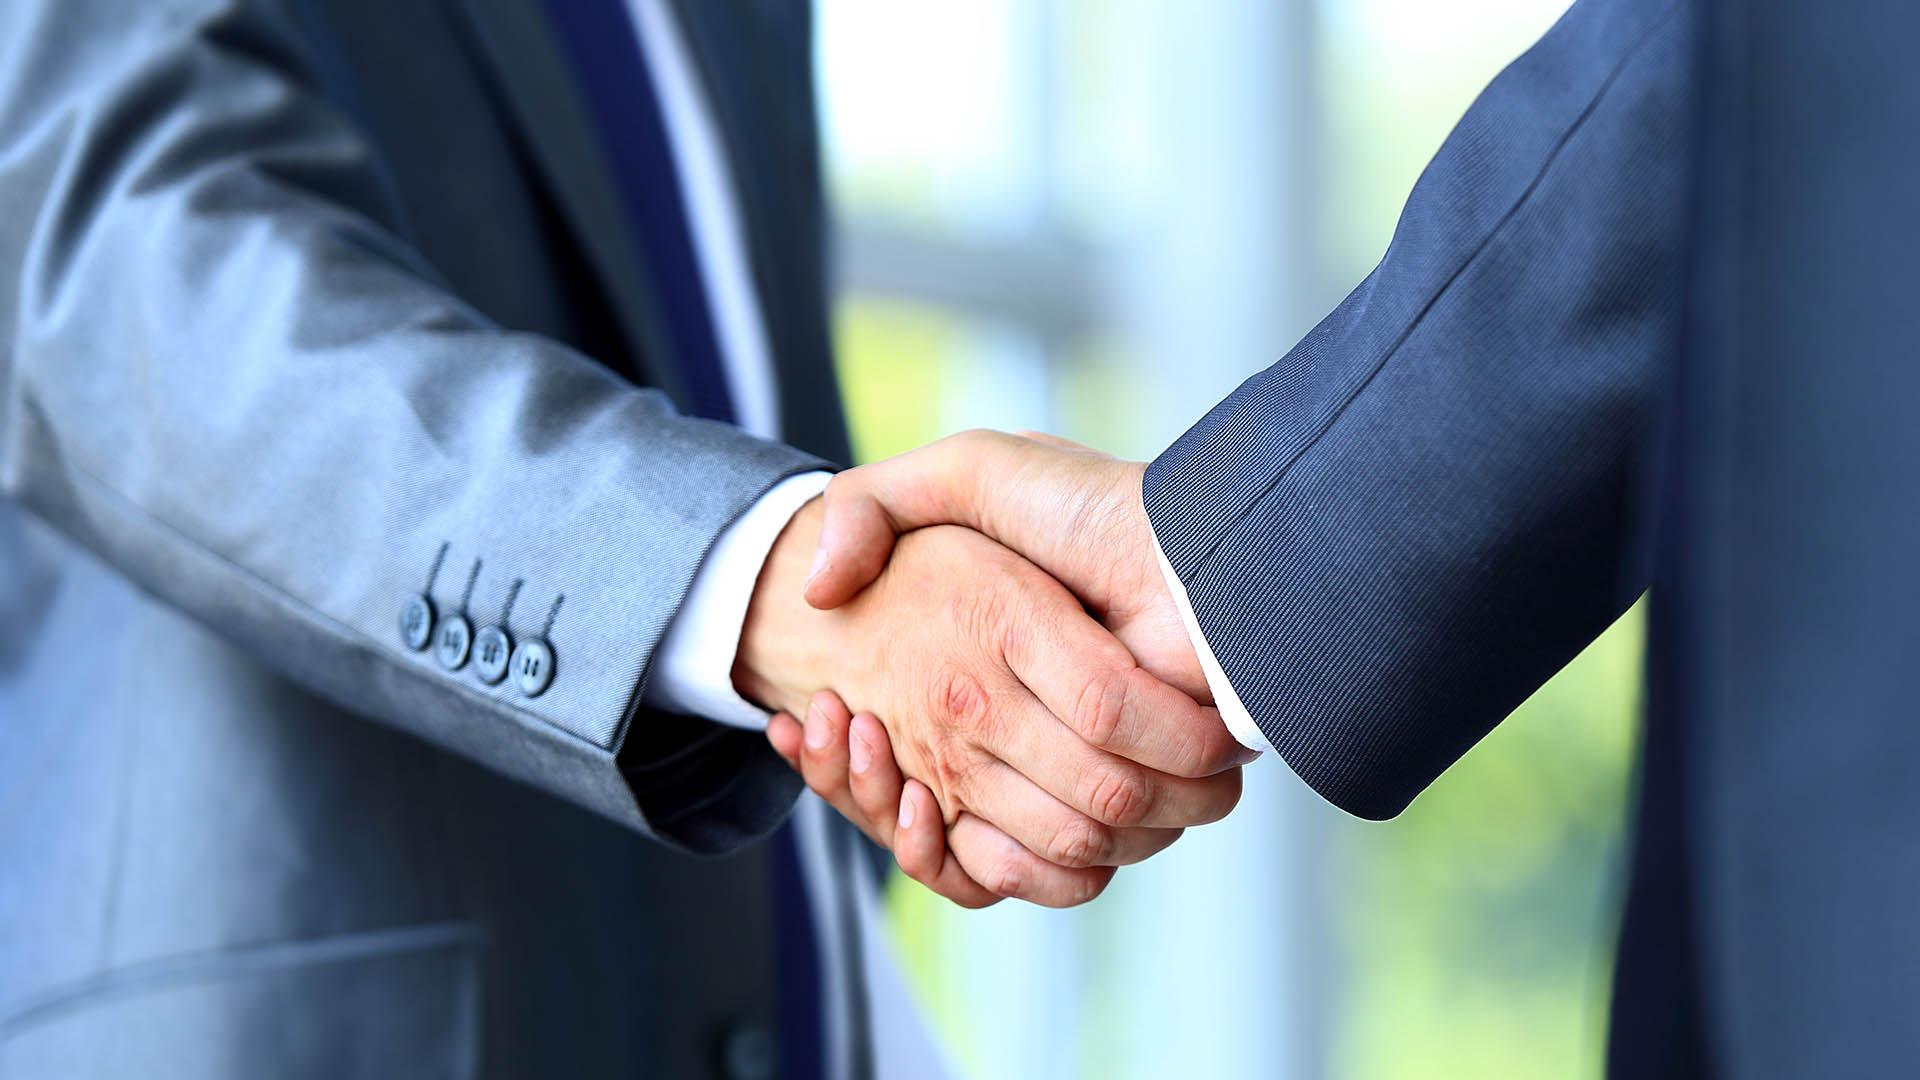 Vango Mining (ASX:VAN) appoints Andrew Stocks as MD